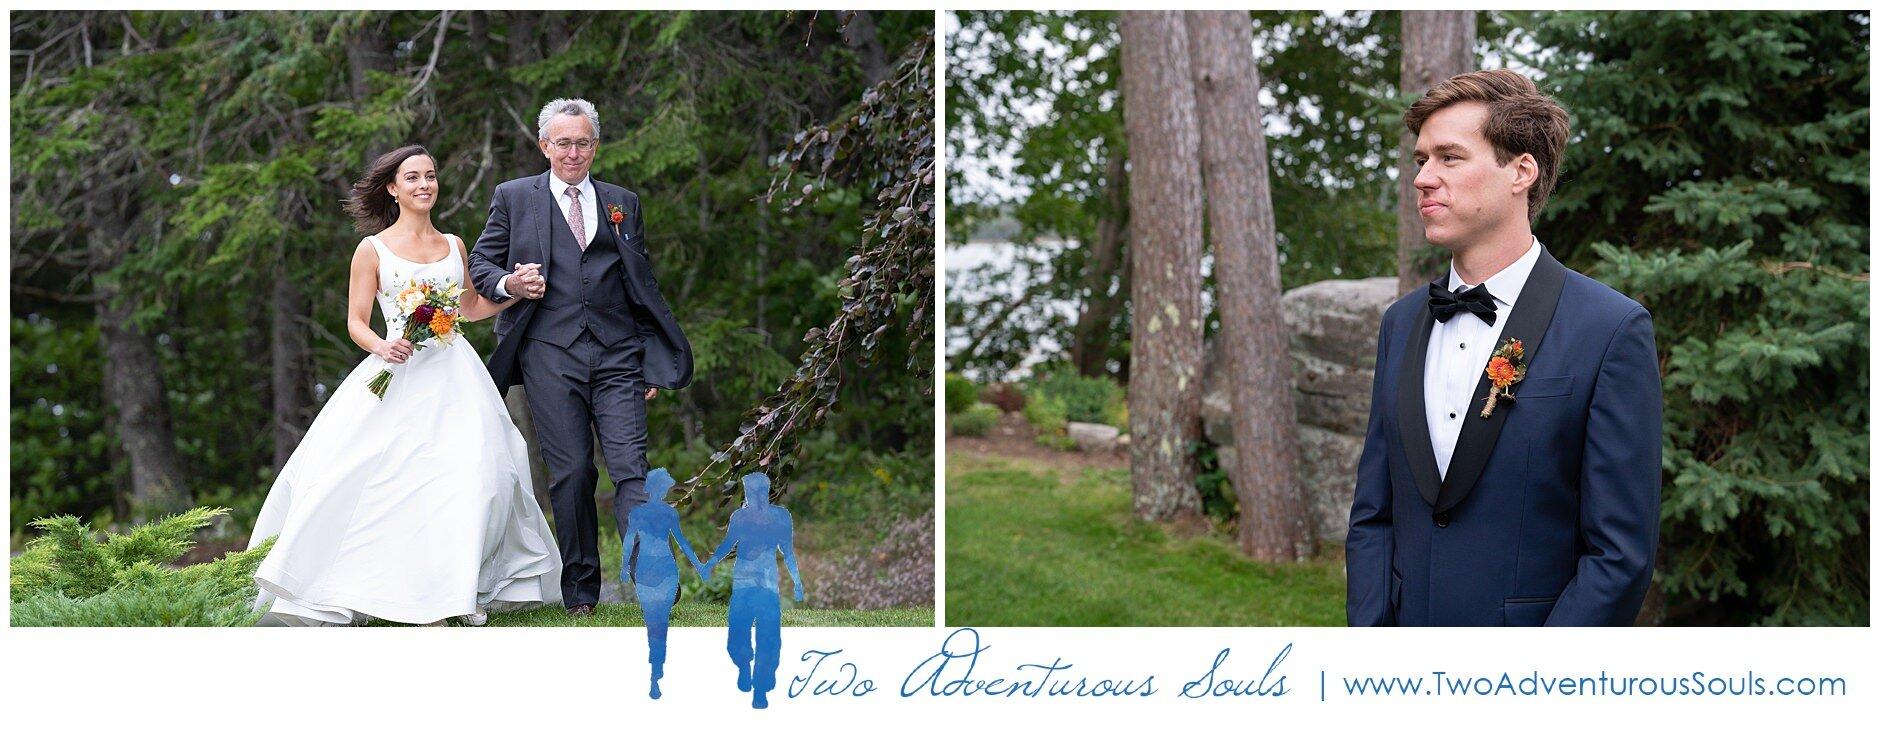 Bar Harbor Wedding Photographers, Acadia Bay Inn Wedding Photographers, Two Adventurous Souls- 091419_0019.jpg